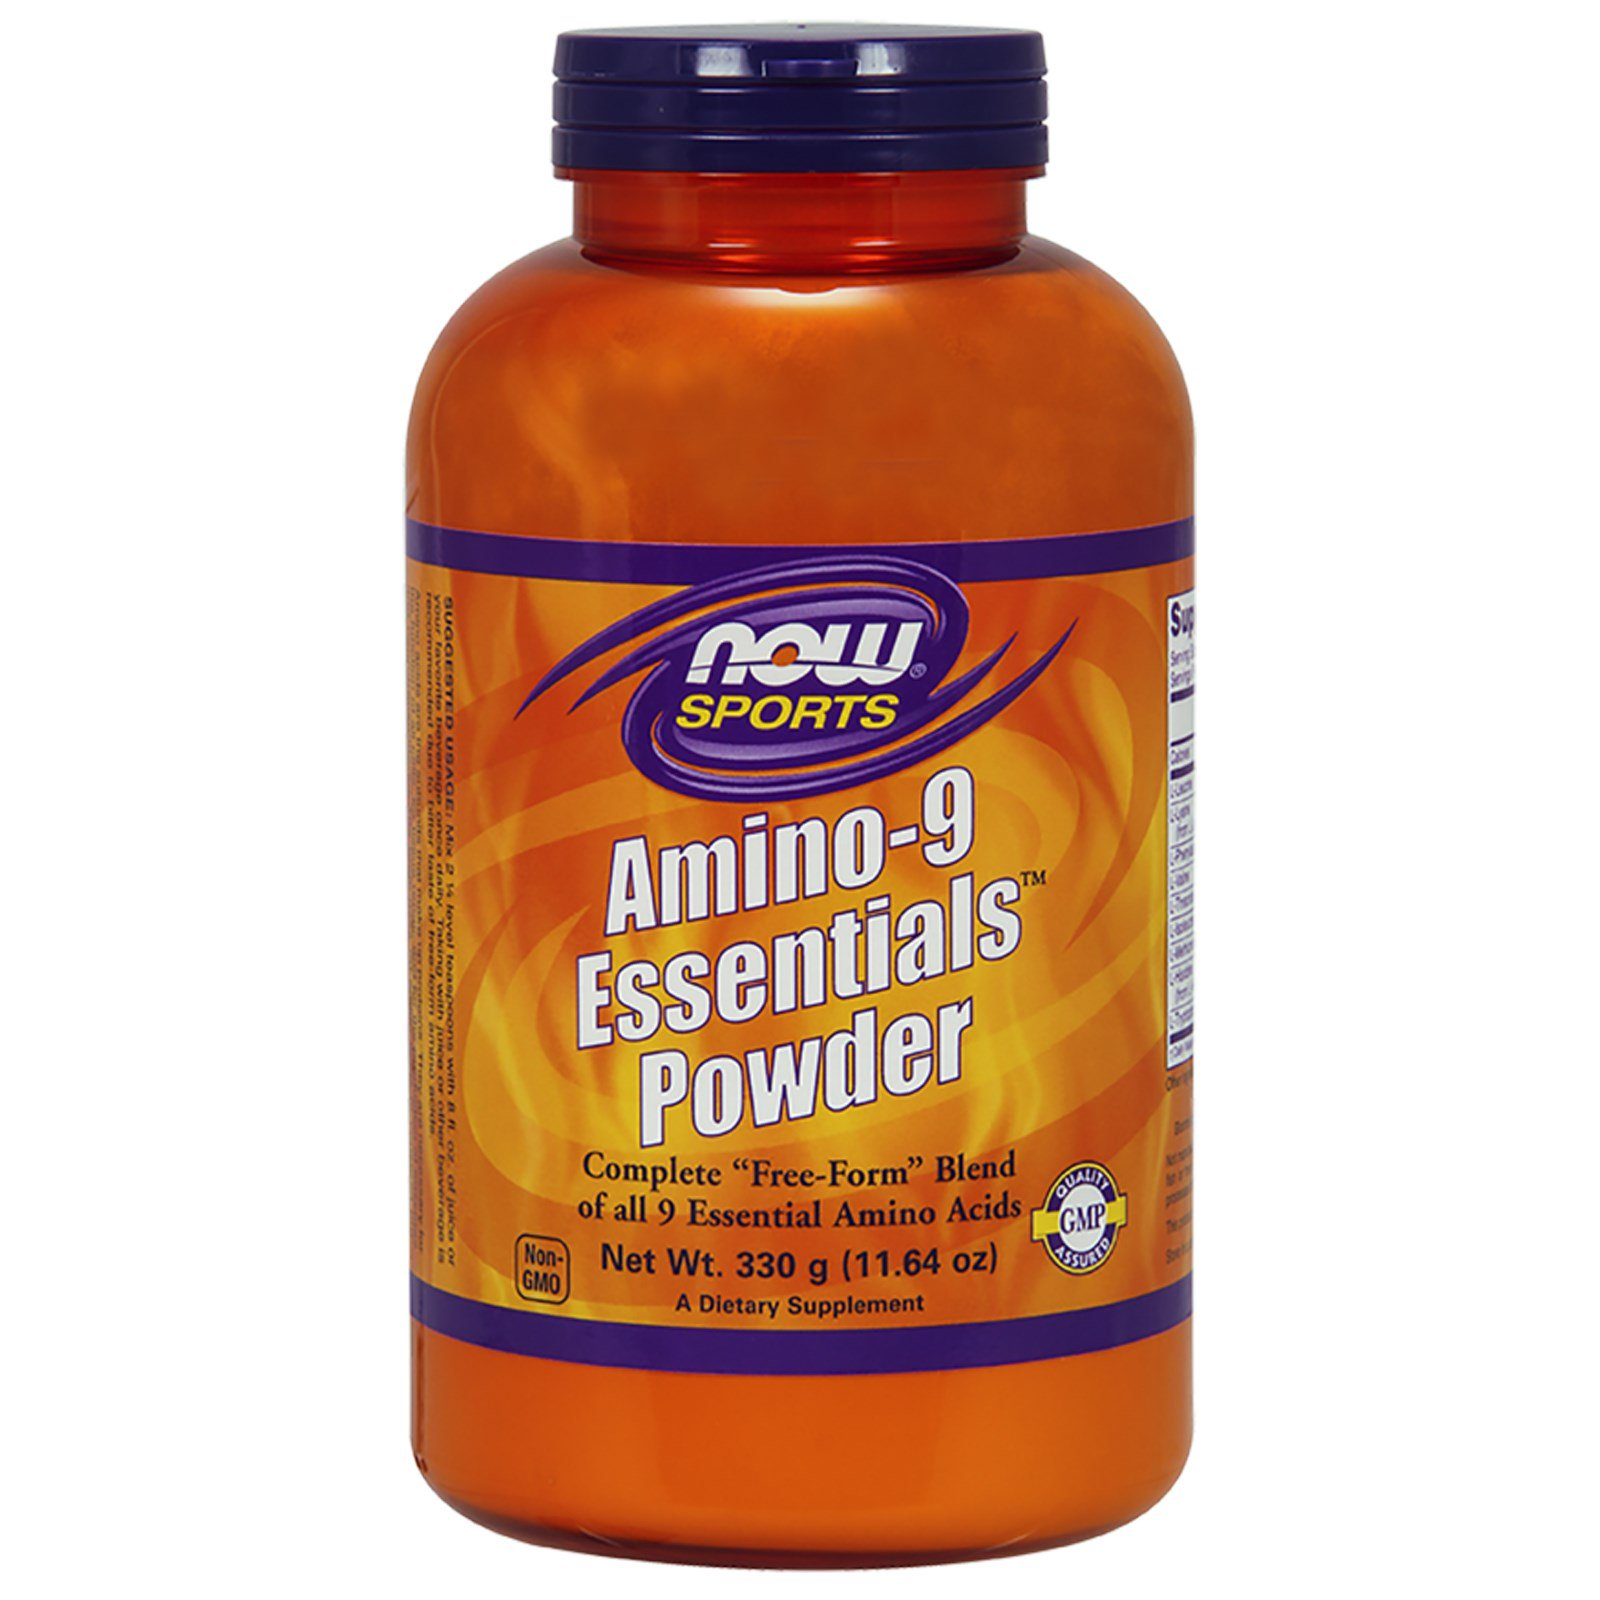 Now Foods, Sports, Amino-9 Essentials Powder, 11.64 oz (330 g)